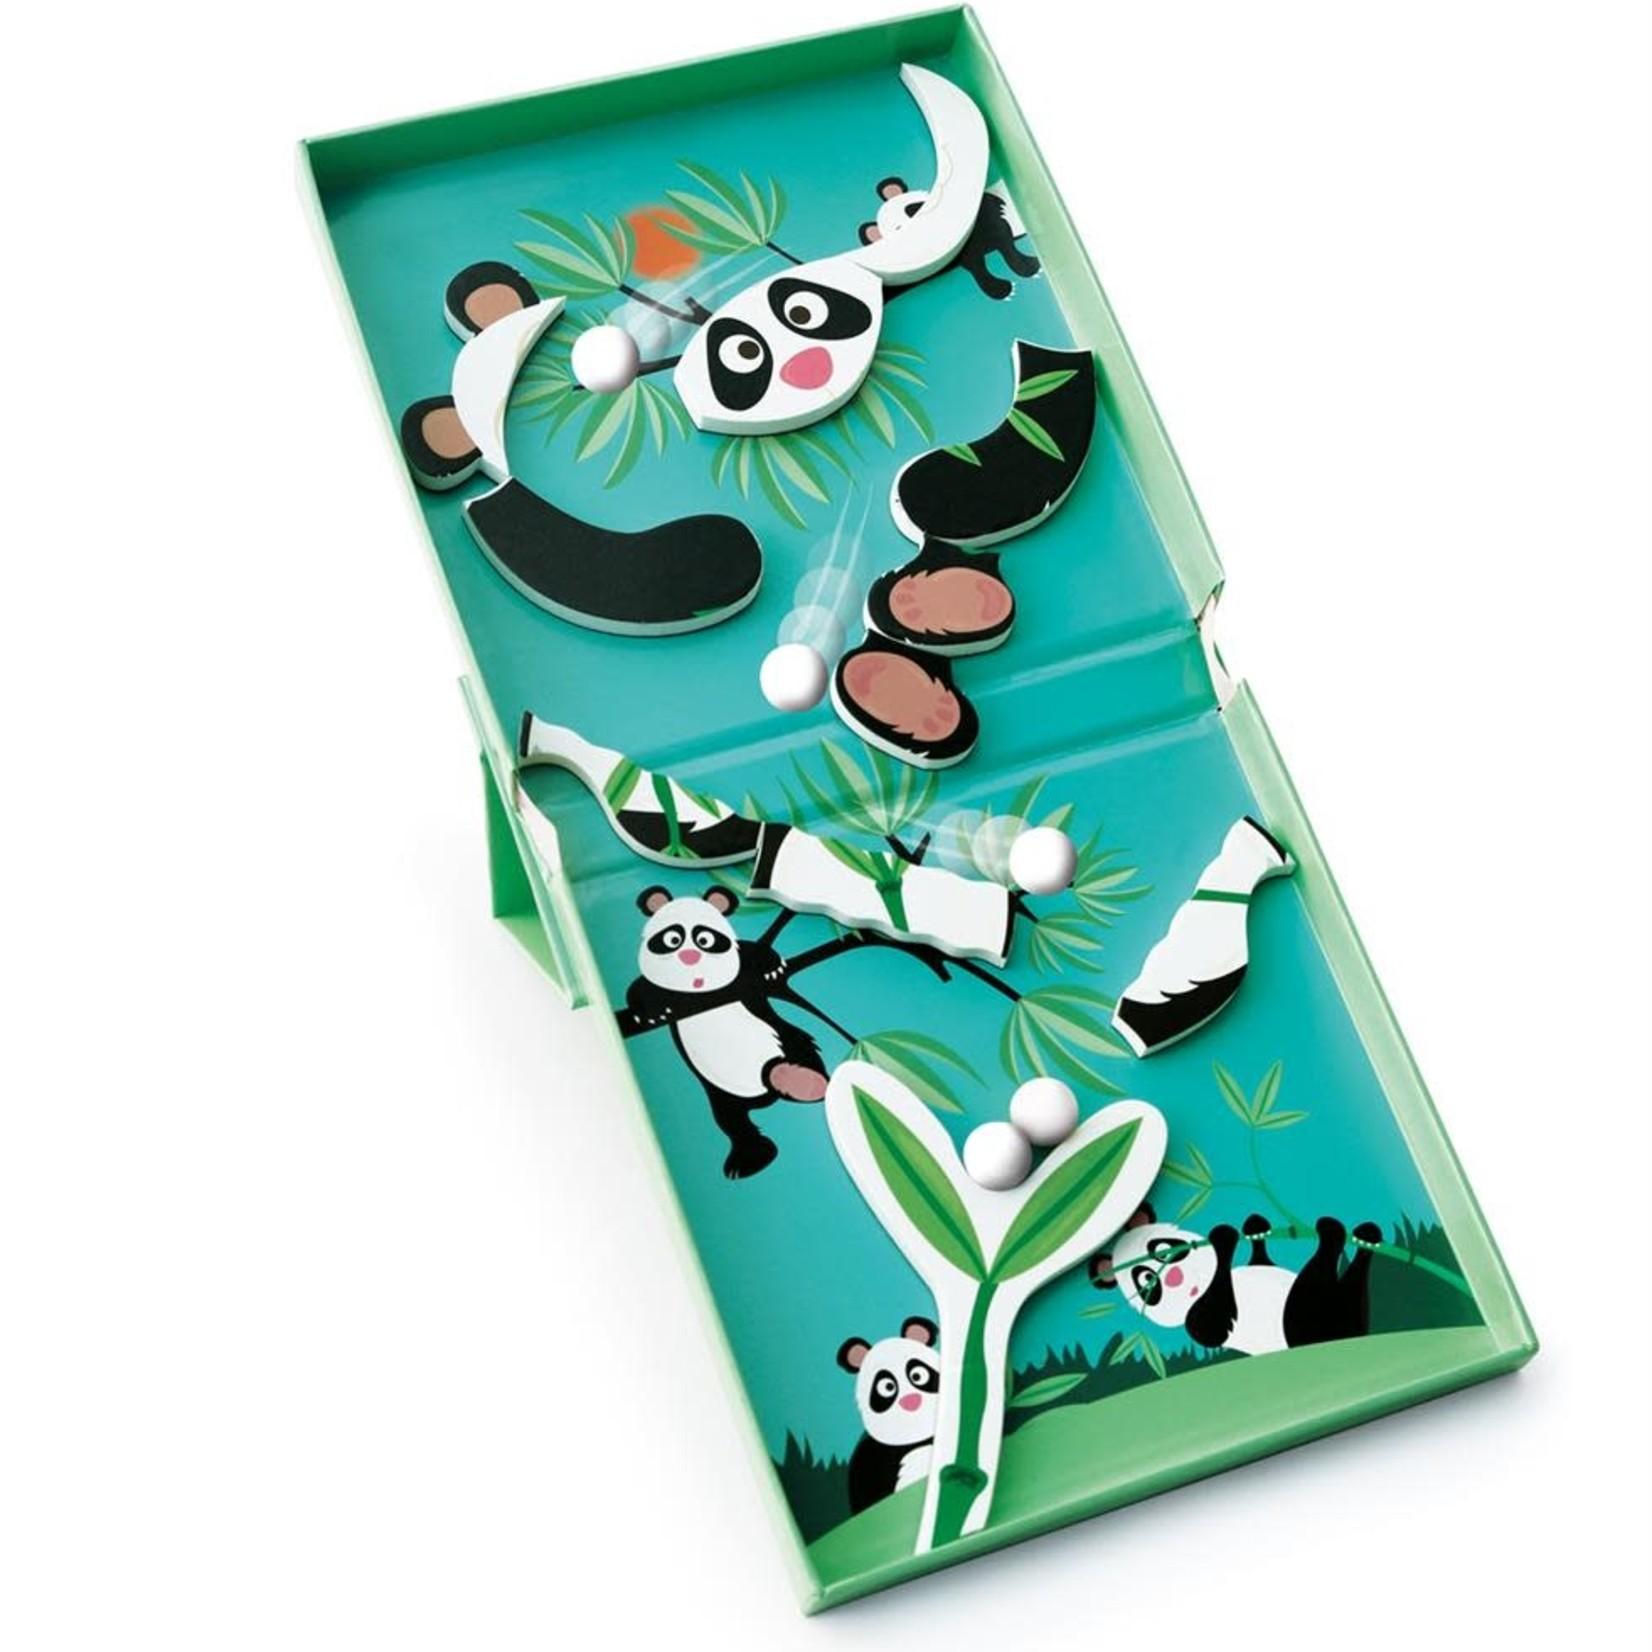 Scratch Magnetische puzzel - Panda